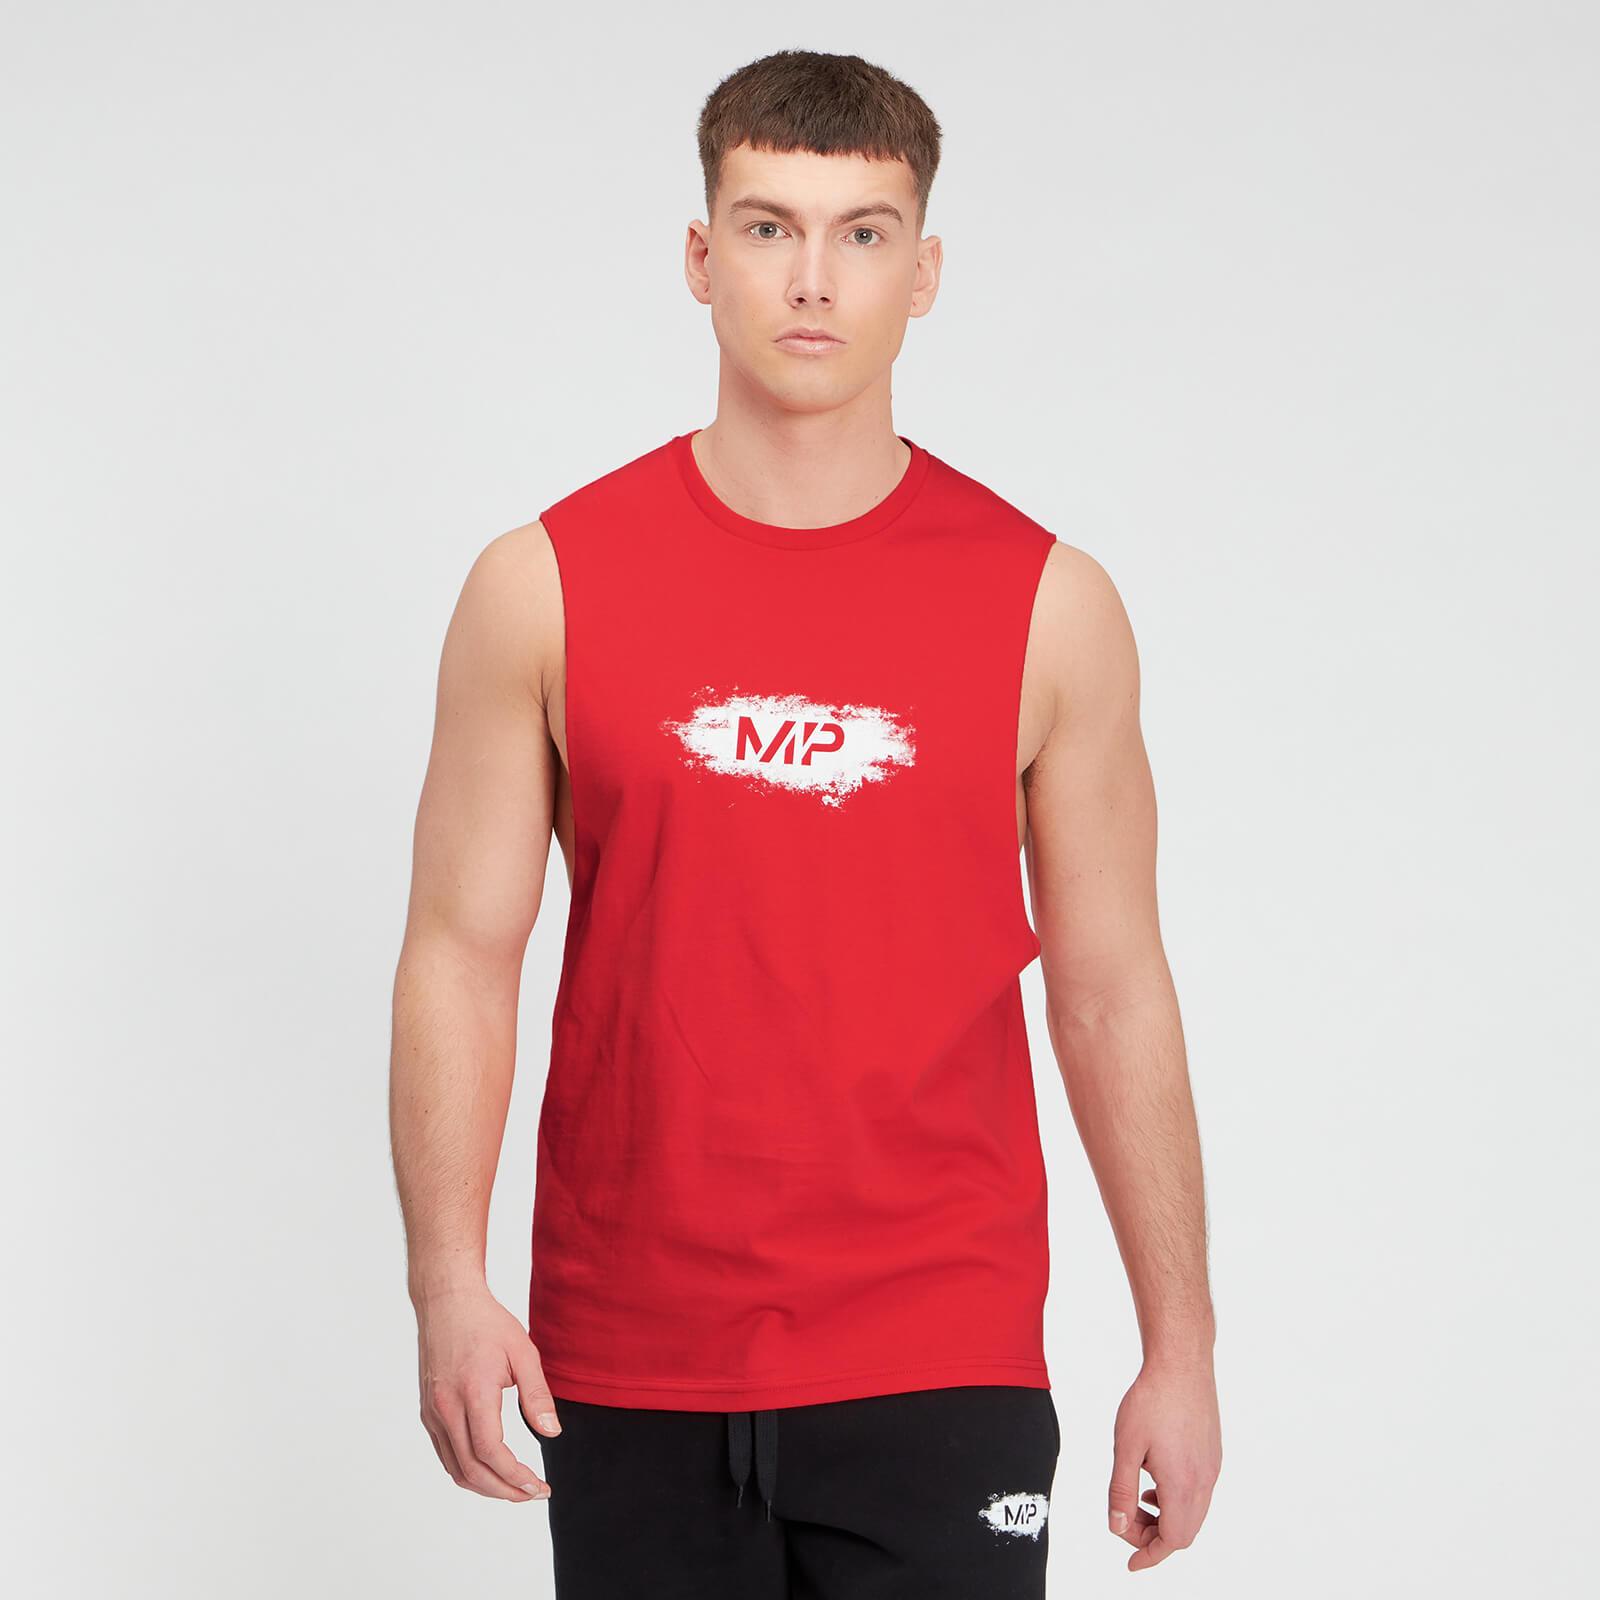 MP Men's Chalk Graphic Tank Top - Danger - XXL